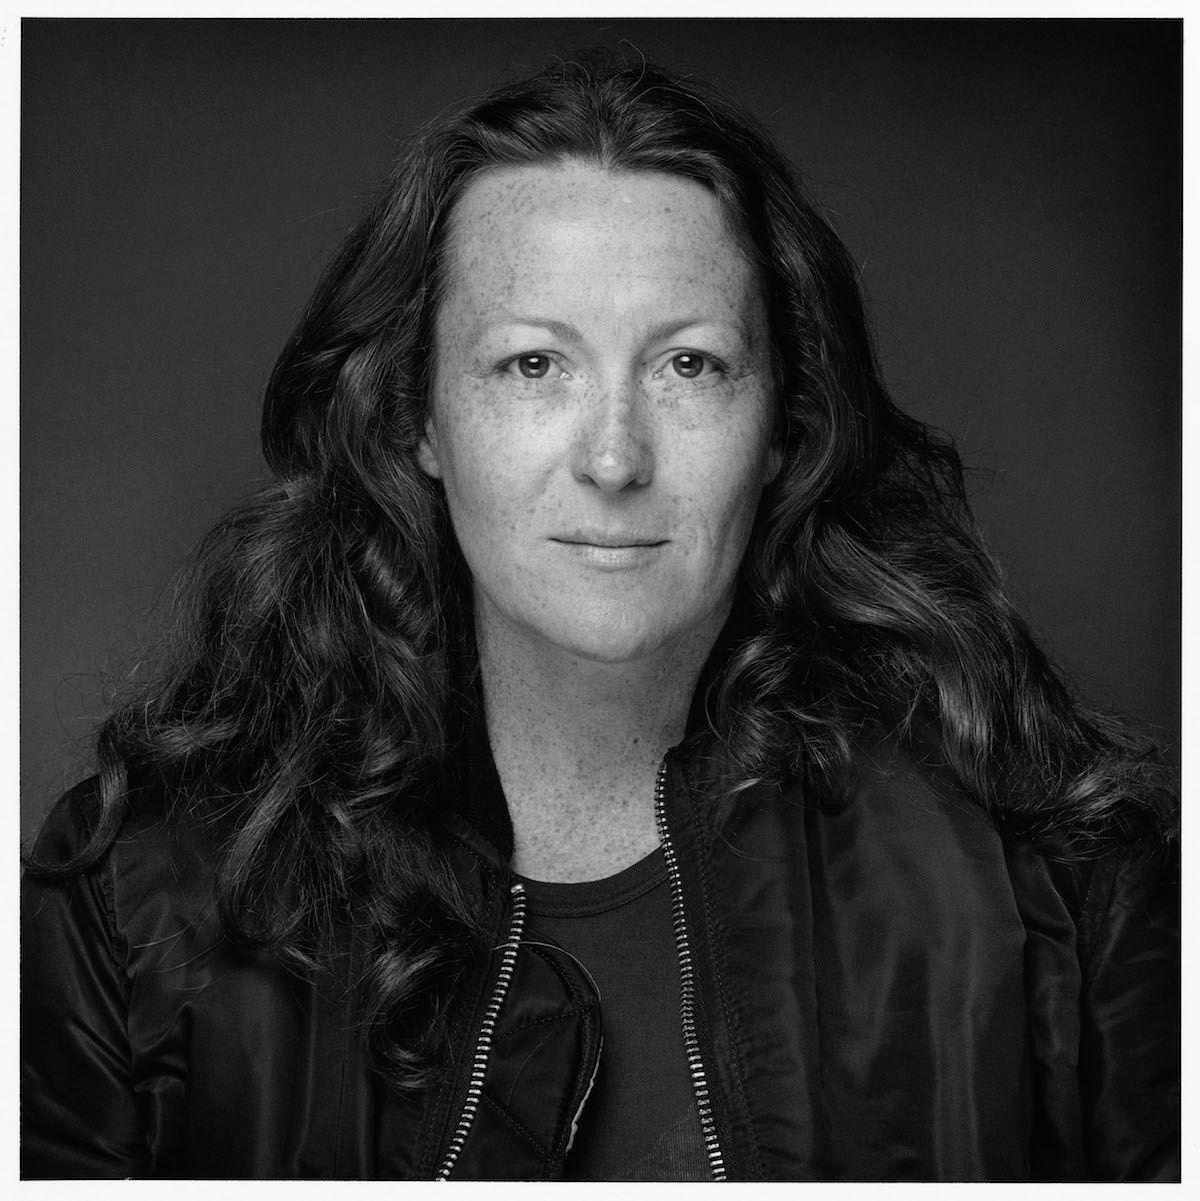 Nancy Reddin Kienholz. Photo by Marsha Burns. Courtesy of L.A. Louver, Venice, California.